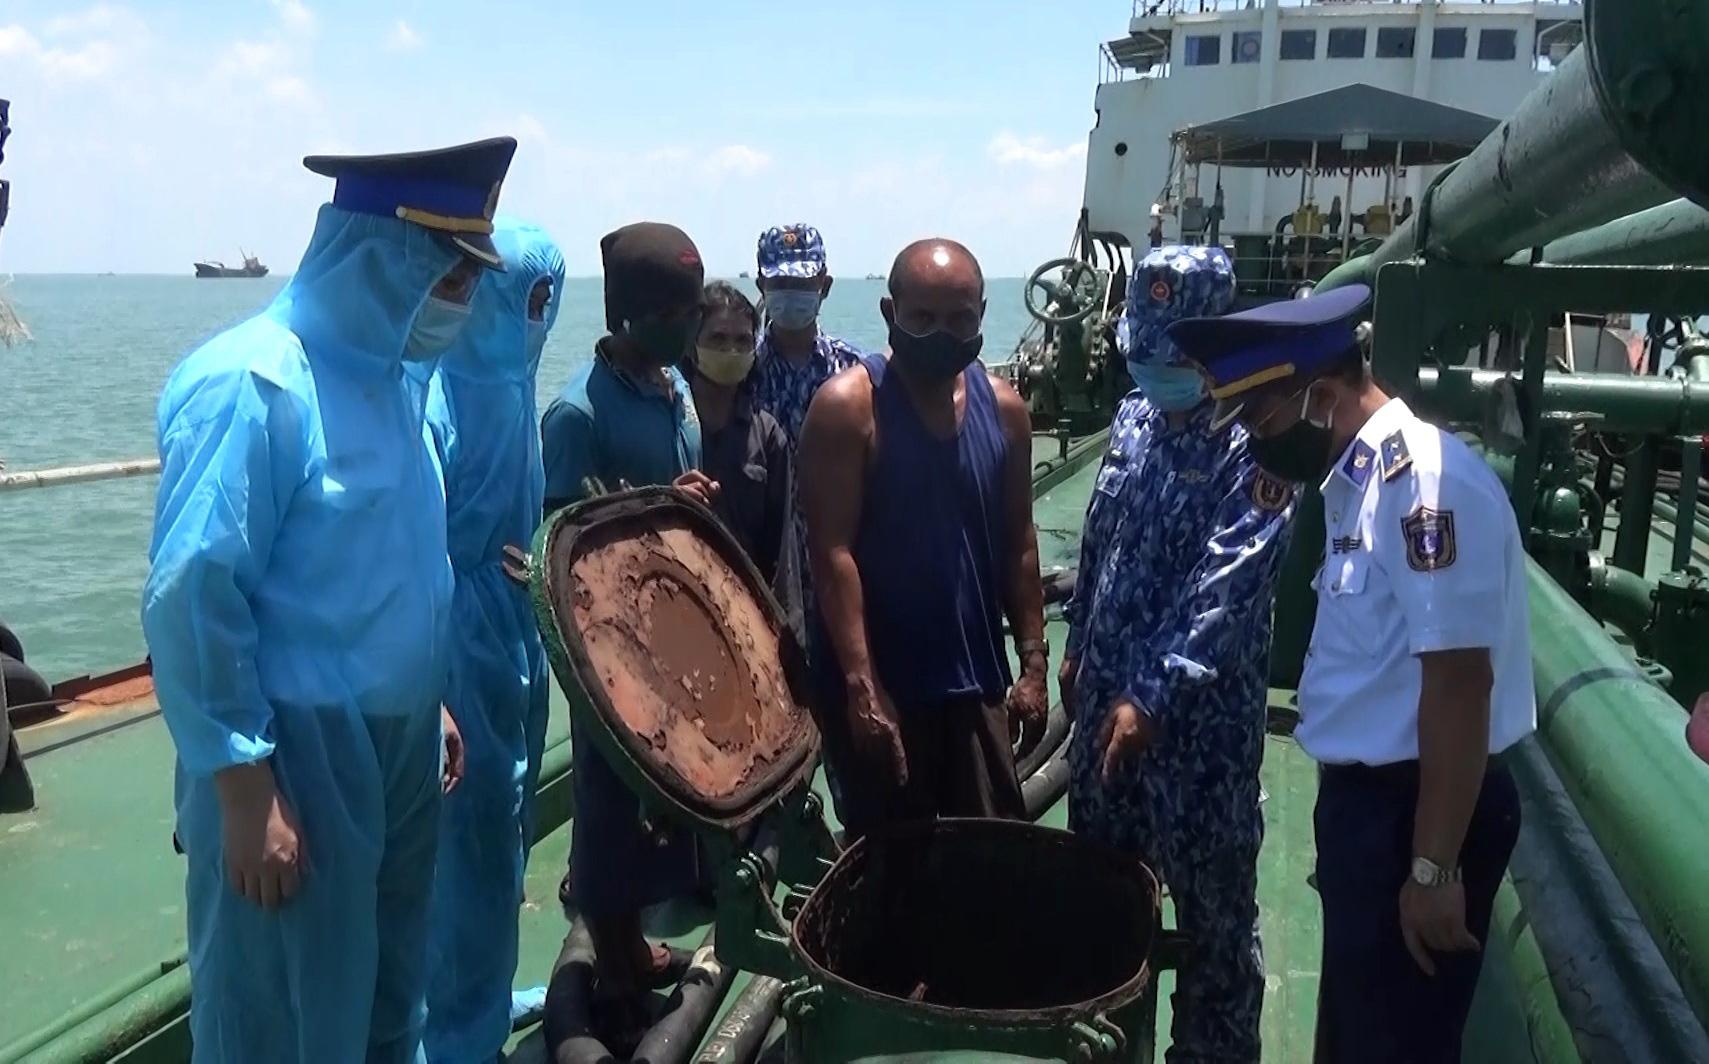 Vietnam Coast Guard officers inspect smuggled oil discovered on sea vessel Siam Varich off Con Dao Island, Ba Ria-Vung Tau Province, Vietnam. Photo: Duc Dinh / Tuoi Tre